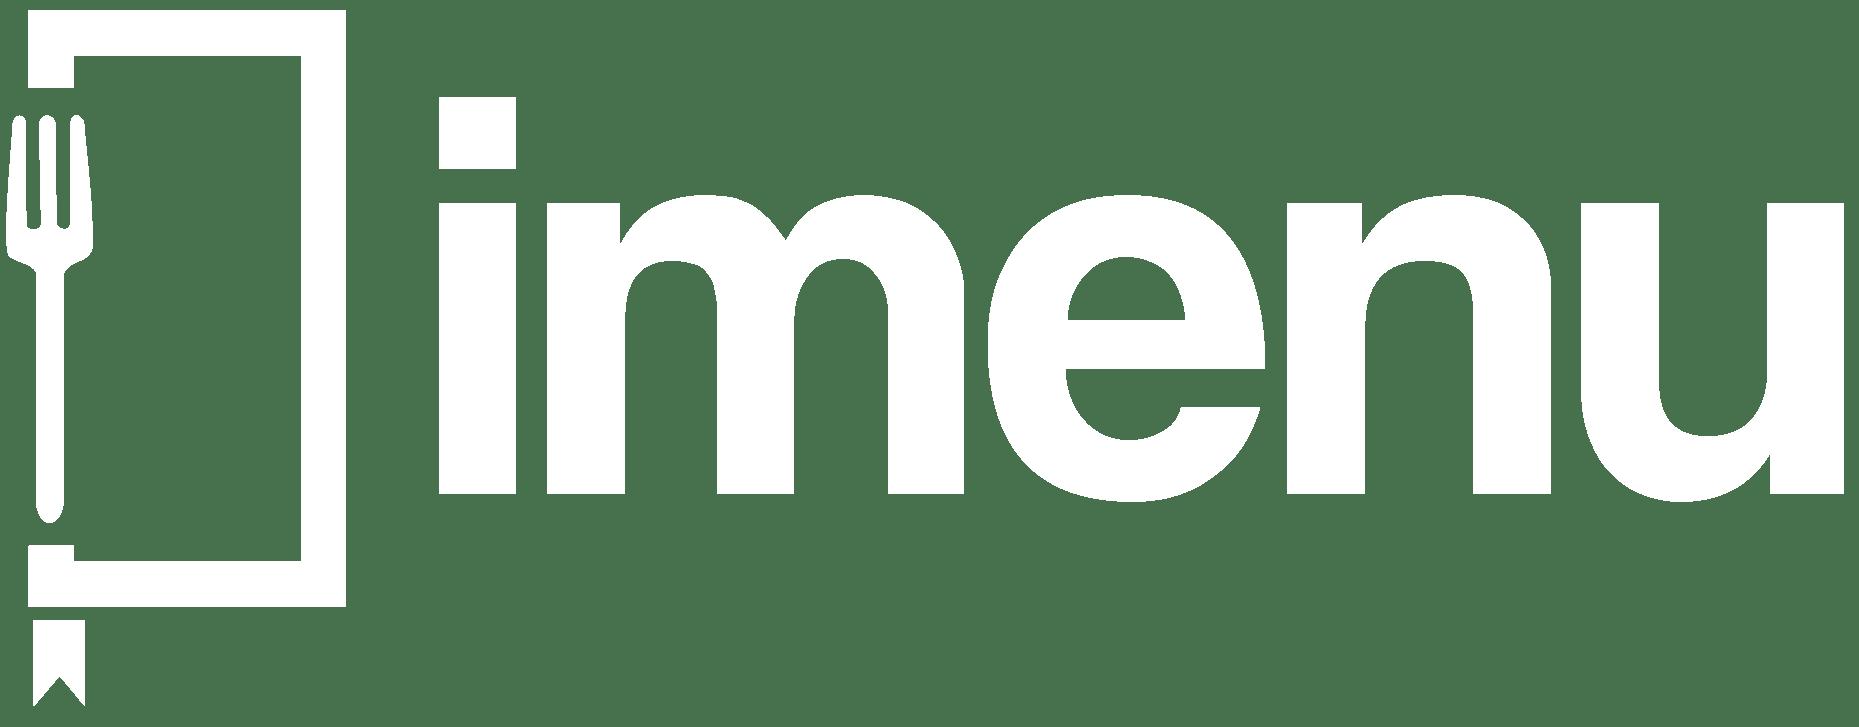 Order food app - iMenu